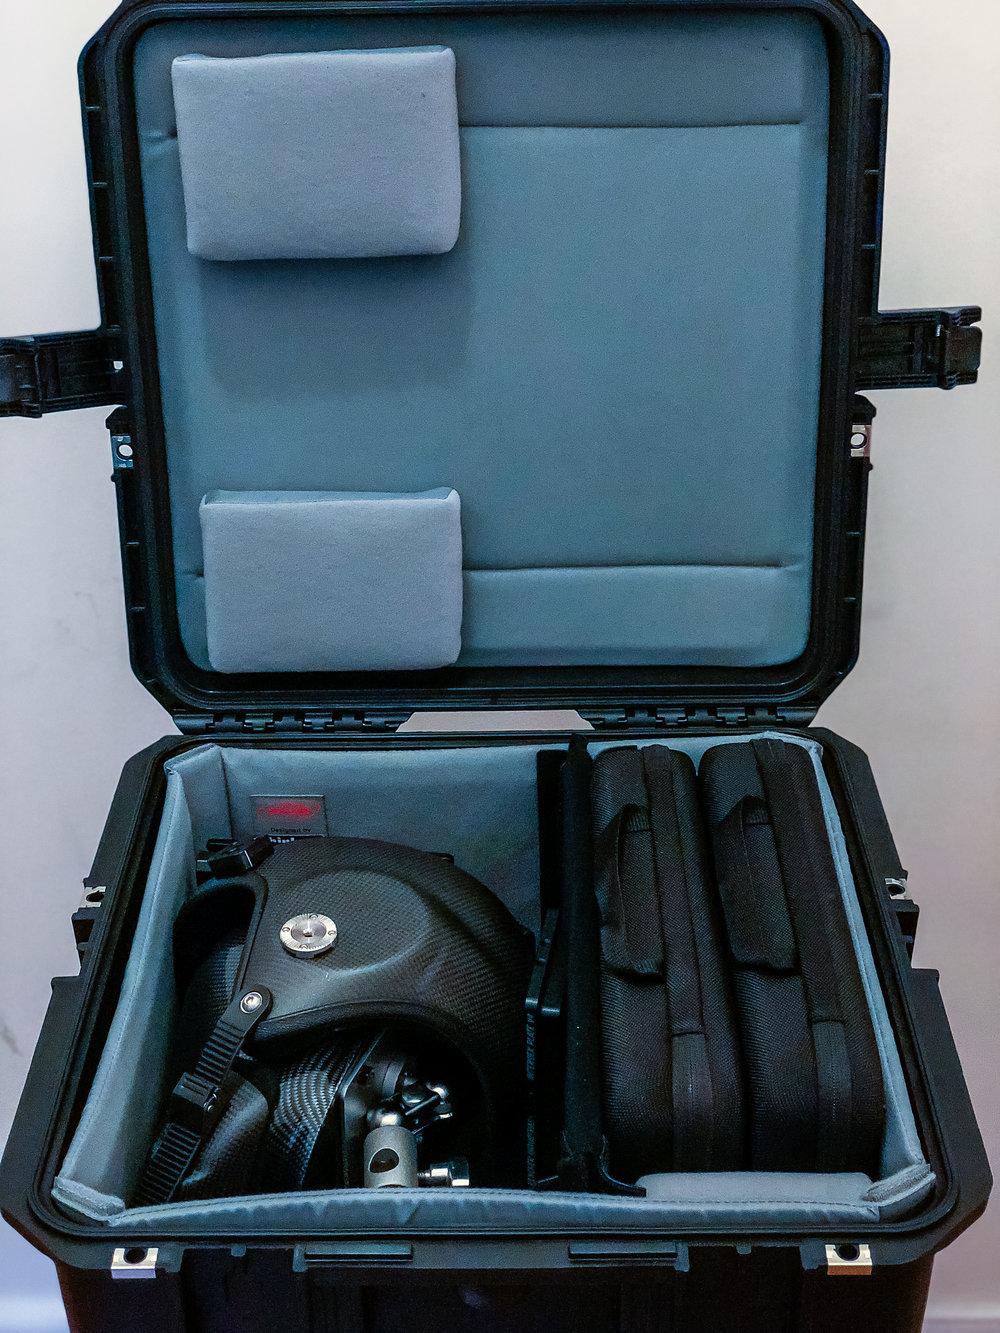 Case interior view